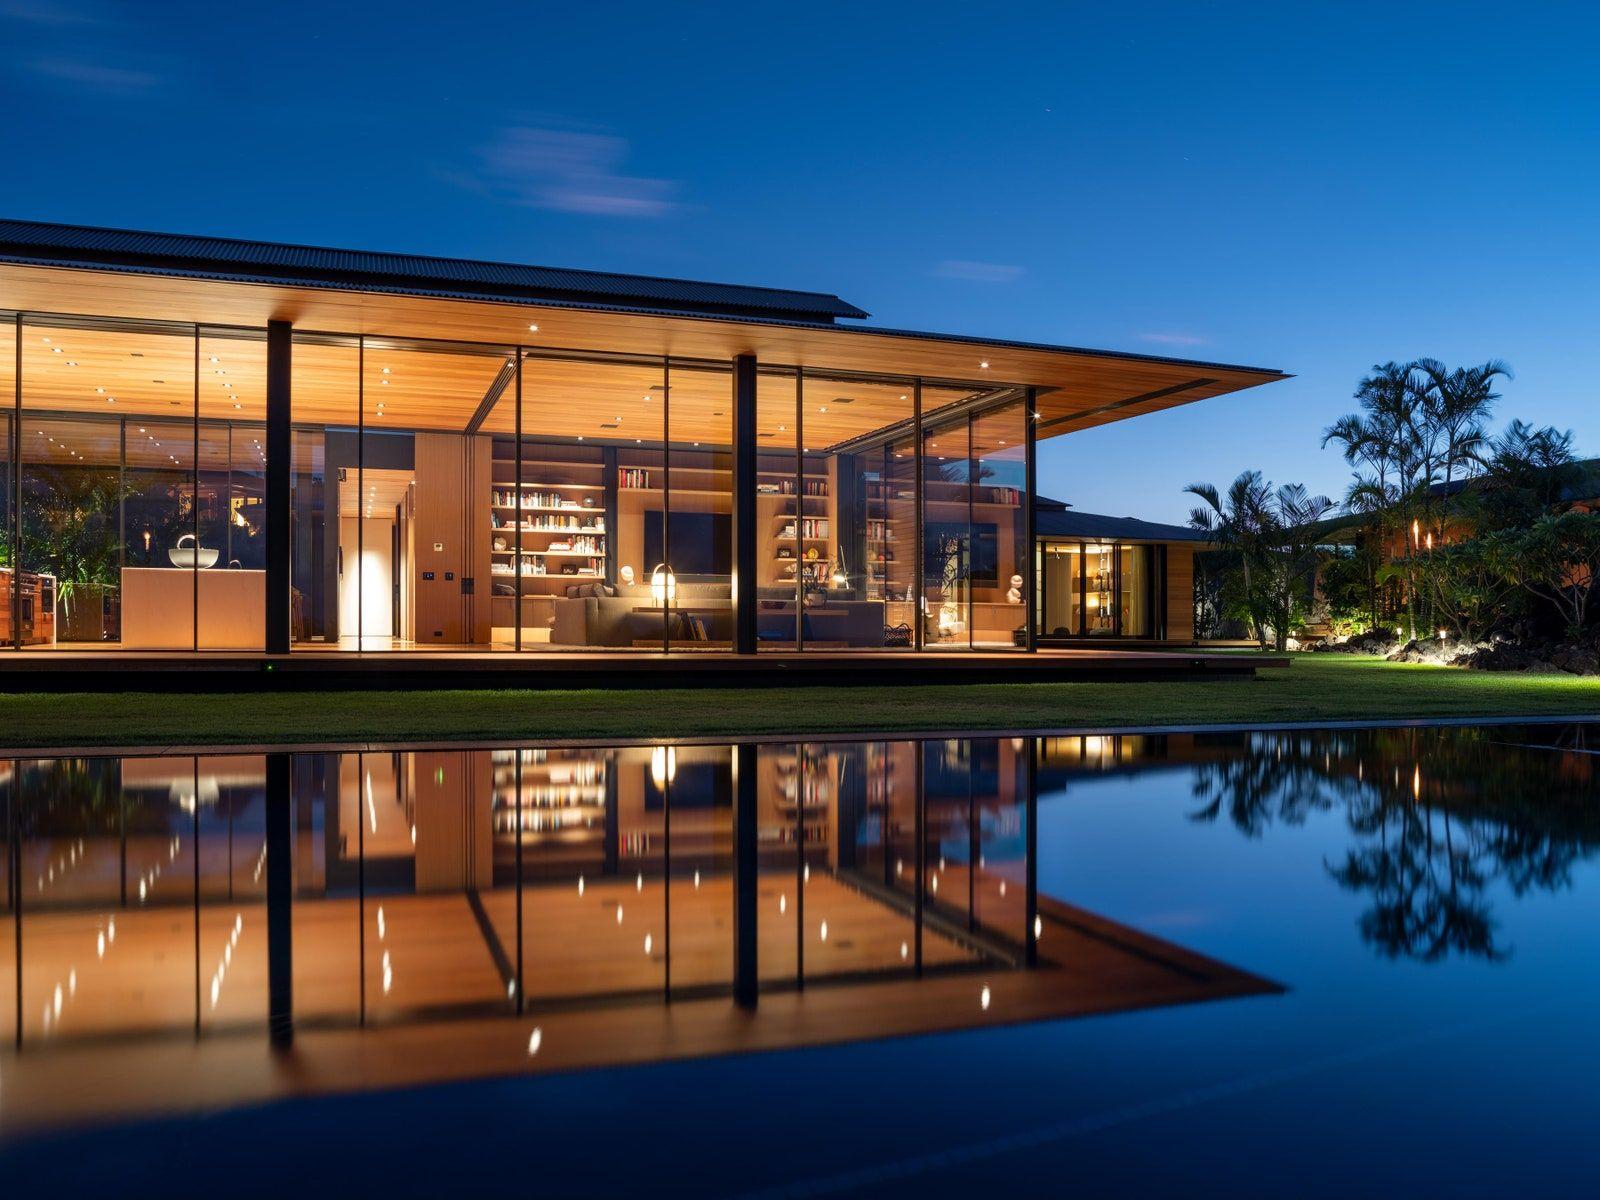 Olson Kundig S Latest Design Embraces Its Hawaiian Habitat Floating House Architecture Architectural Digest